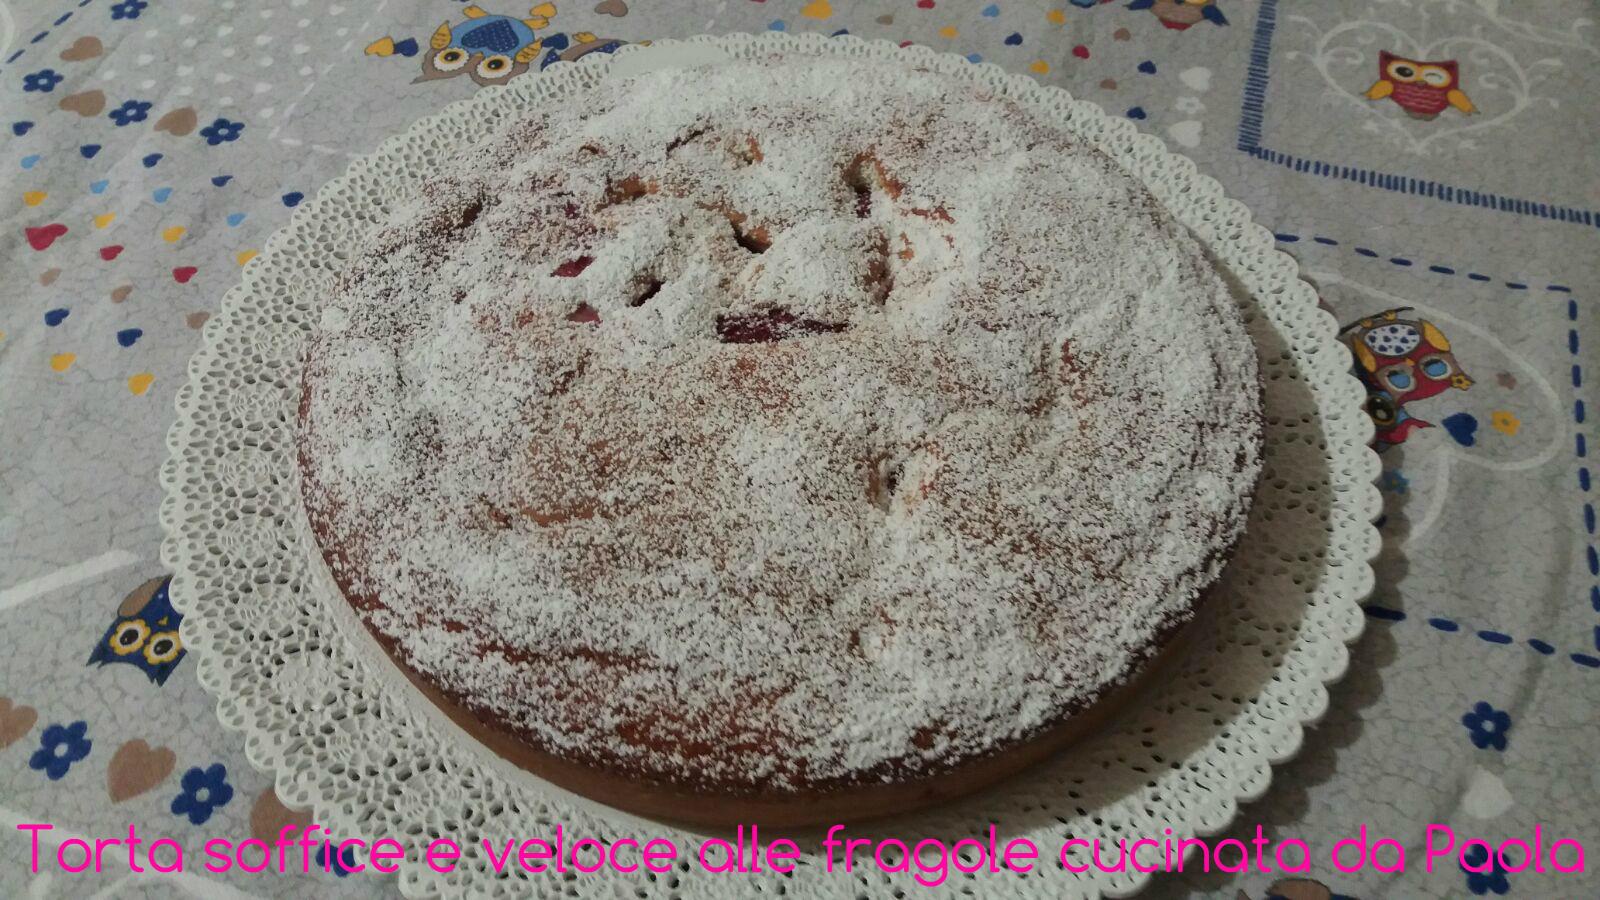 Torta soffice e veloce cucinata da Paola